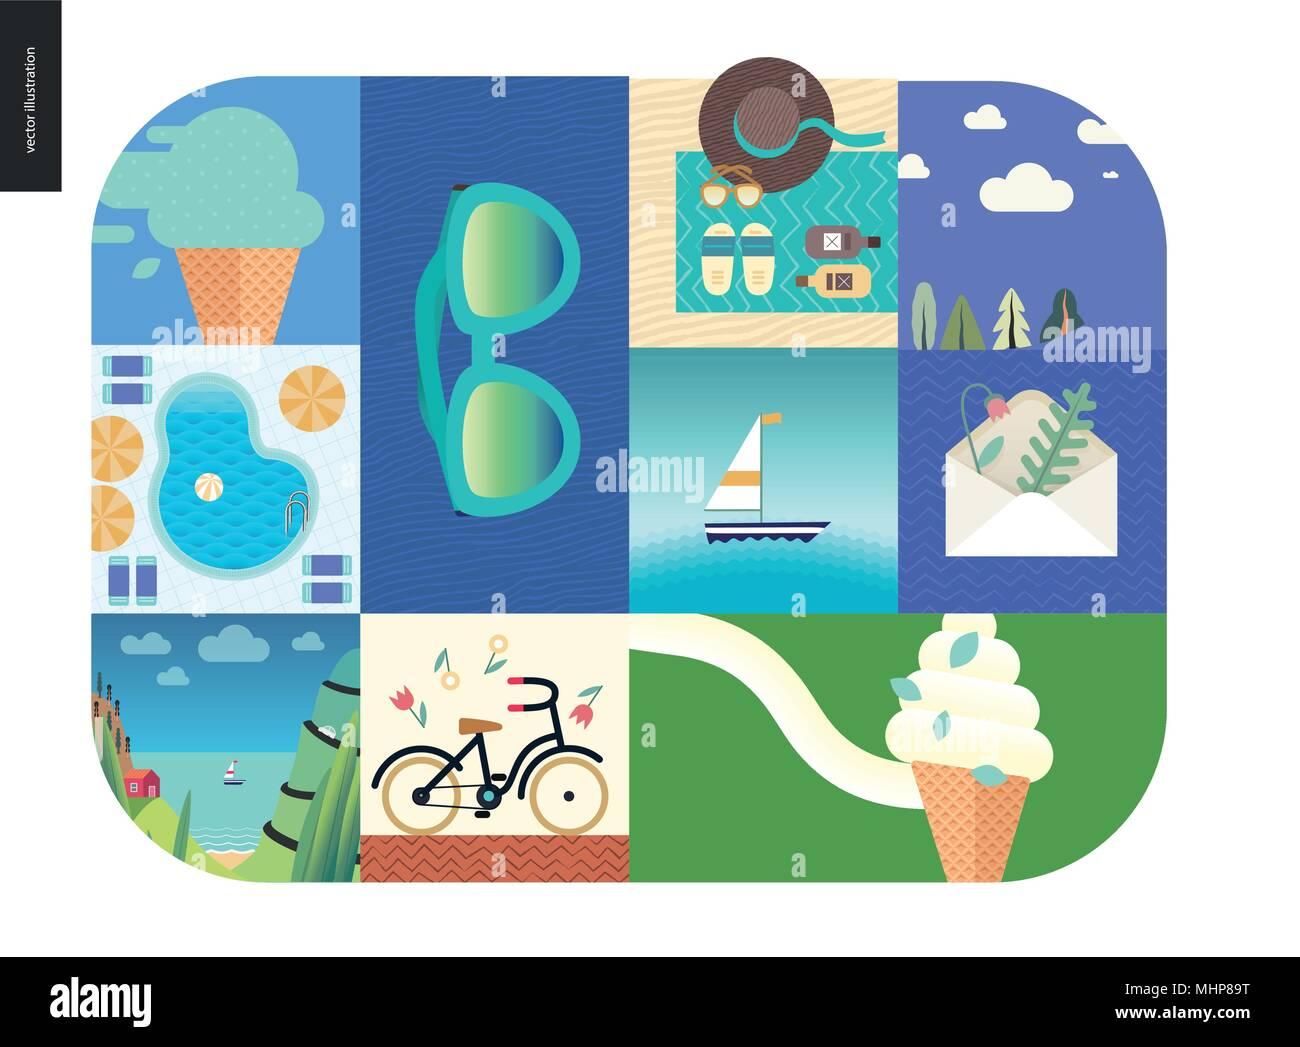 Cose semplici vacanze cartoon piatta illustrazione for Cose semplici da costruire